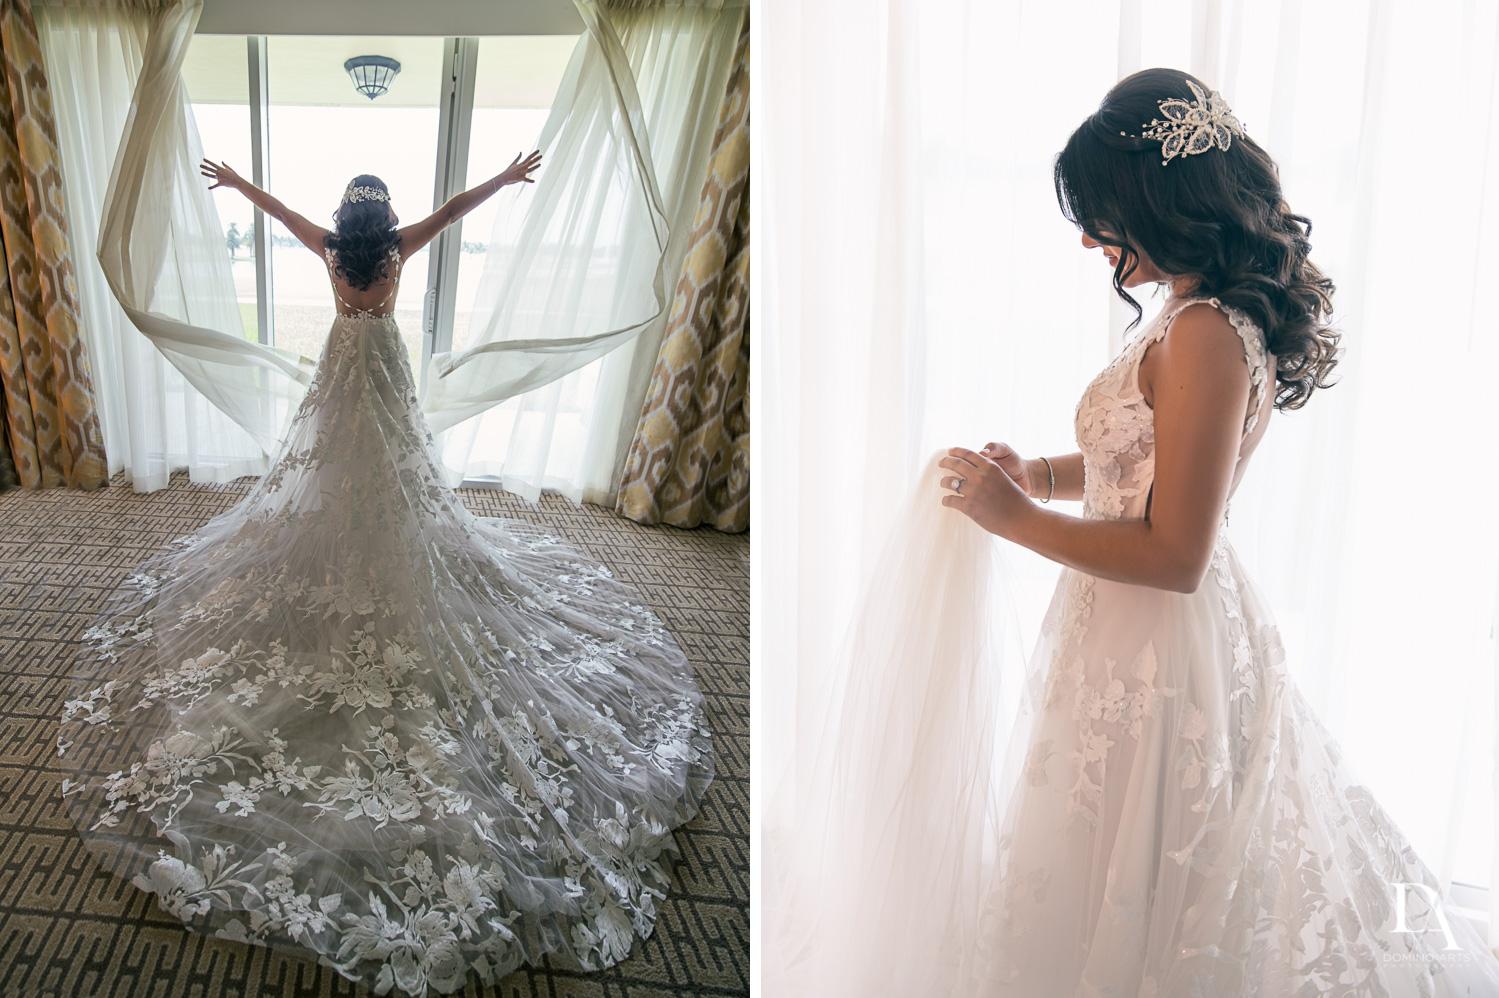 bride getting ready at Elegant Classy Wedding at Trump Doral by Domino Arts Photography